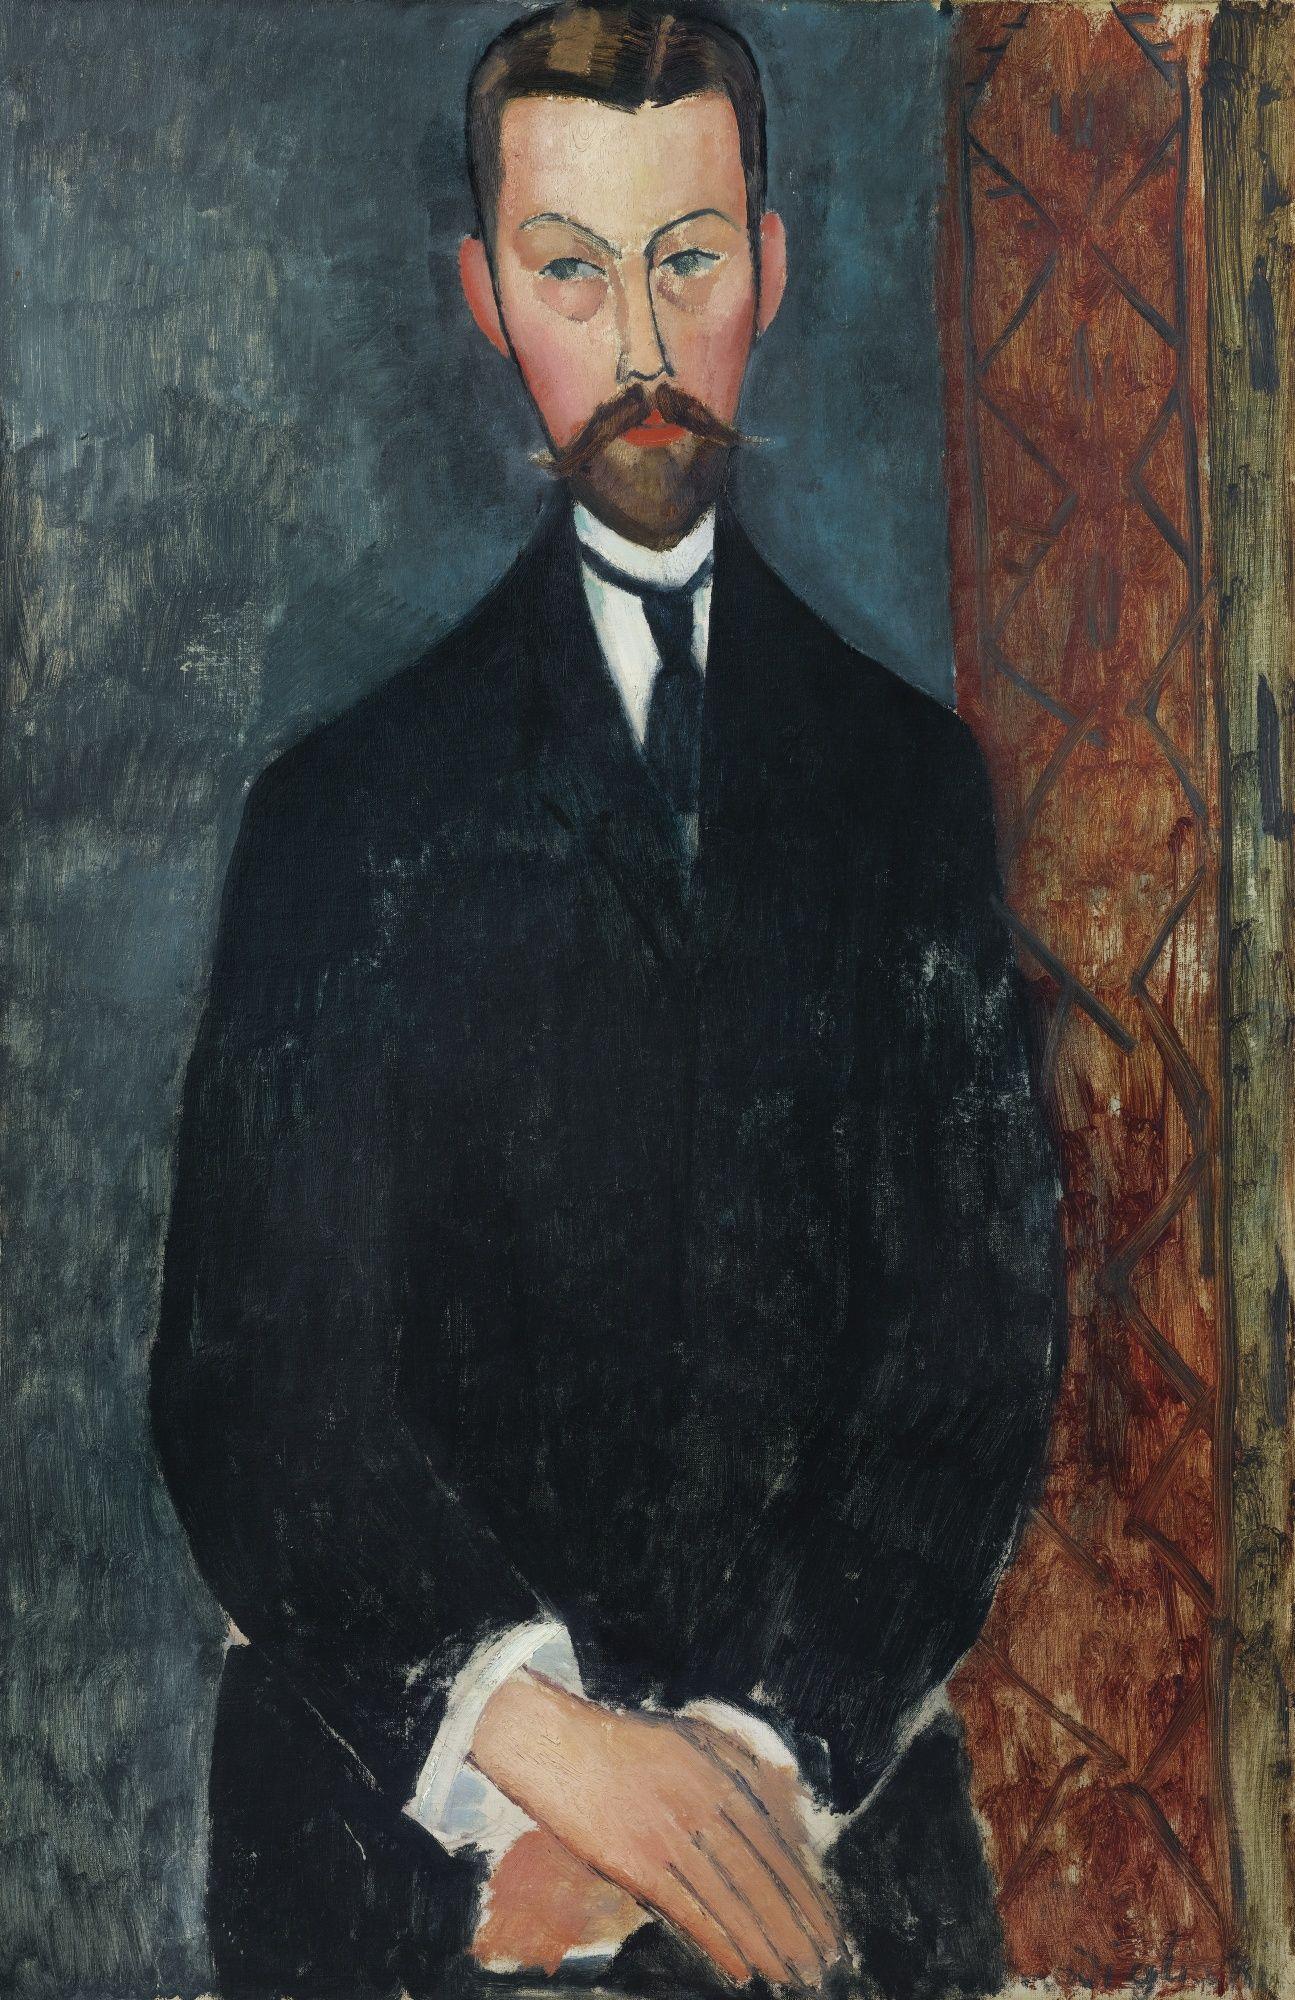 AMEDEO MODIGLIANI 1884 - 1920 PORTRAIT DE PAUL ALEXANDRE signed Modigliani  (lower right) oil on canvas 92 by 60 cm ; 36 1/4 by 23 … | Amedeo  modigliani, Modigliani, Portrait